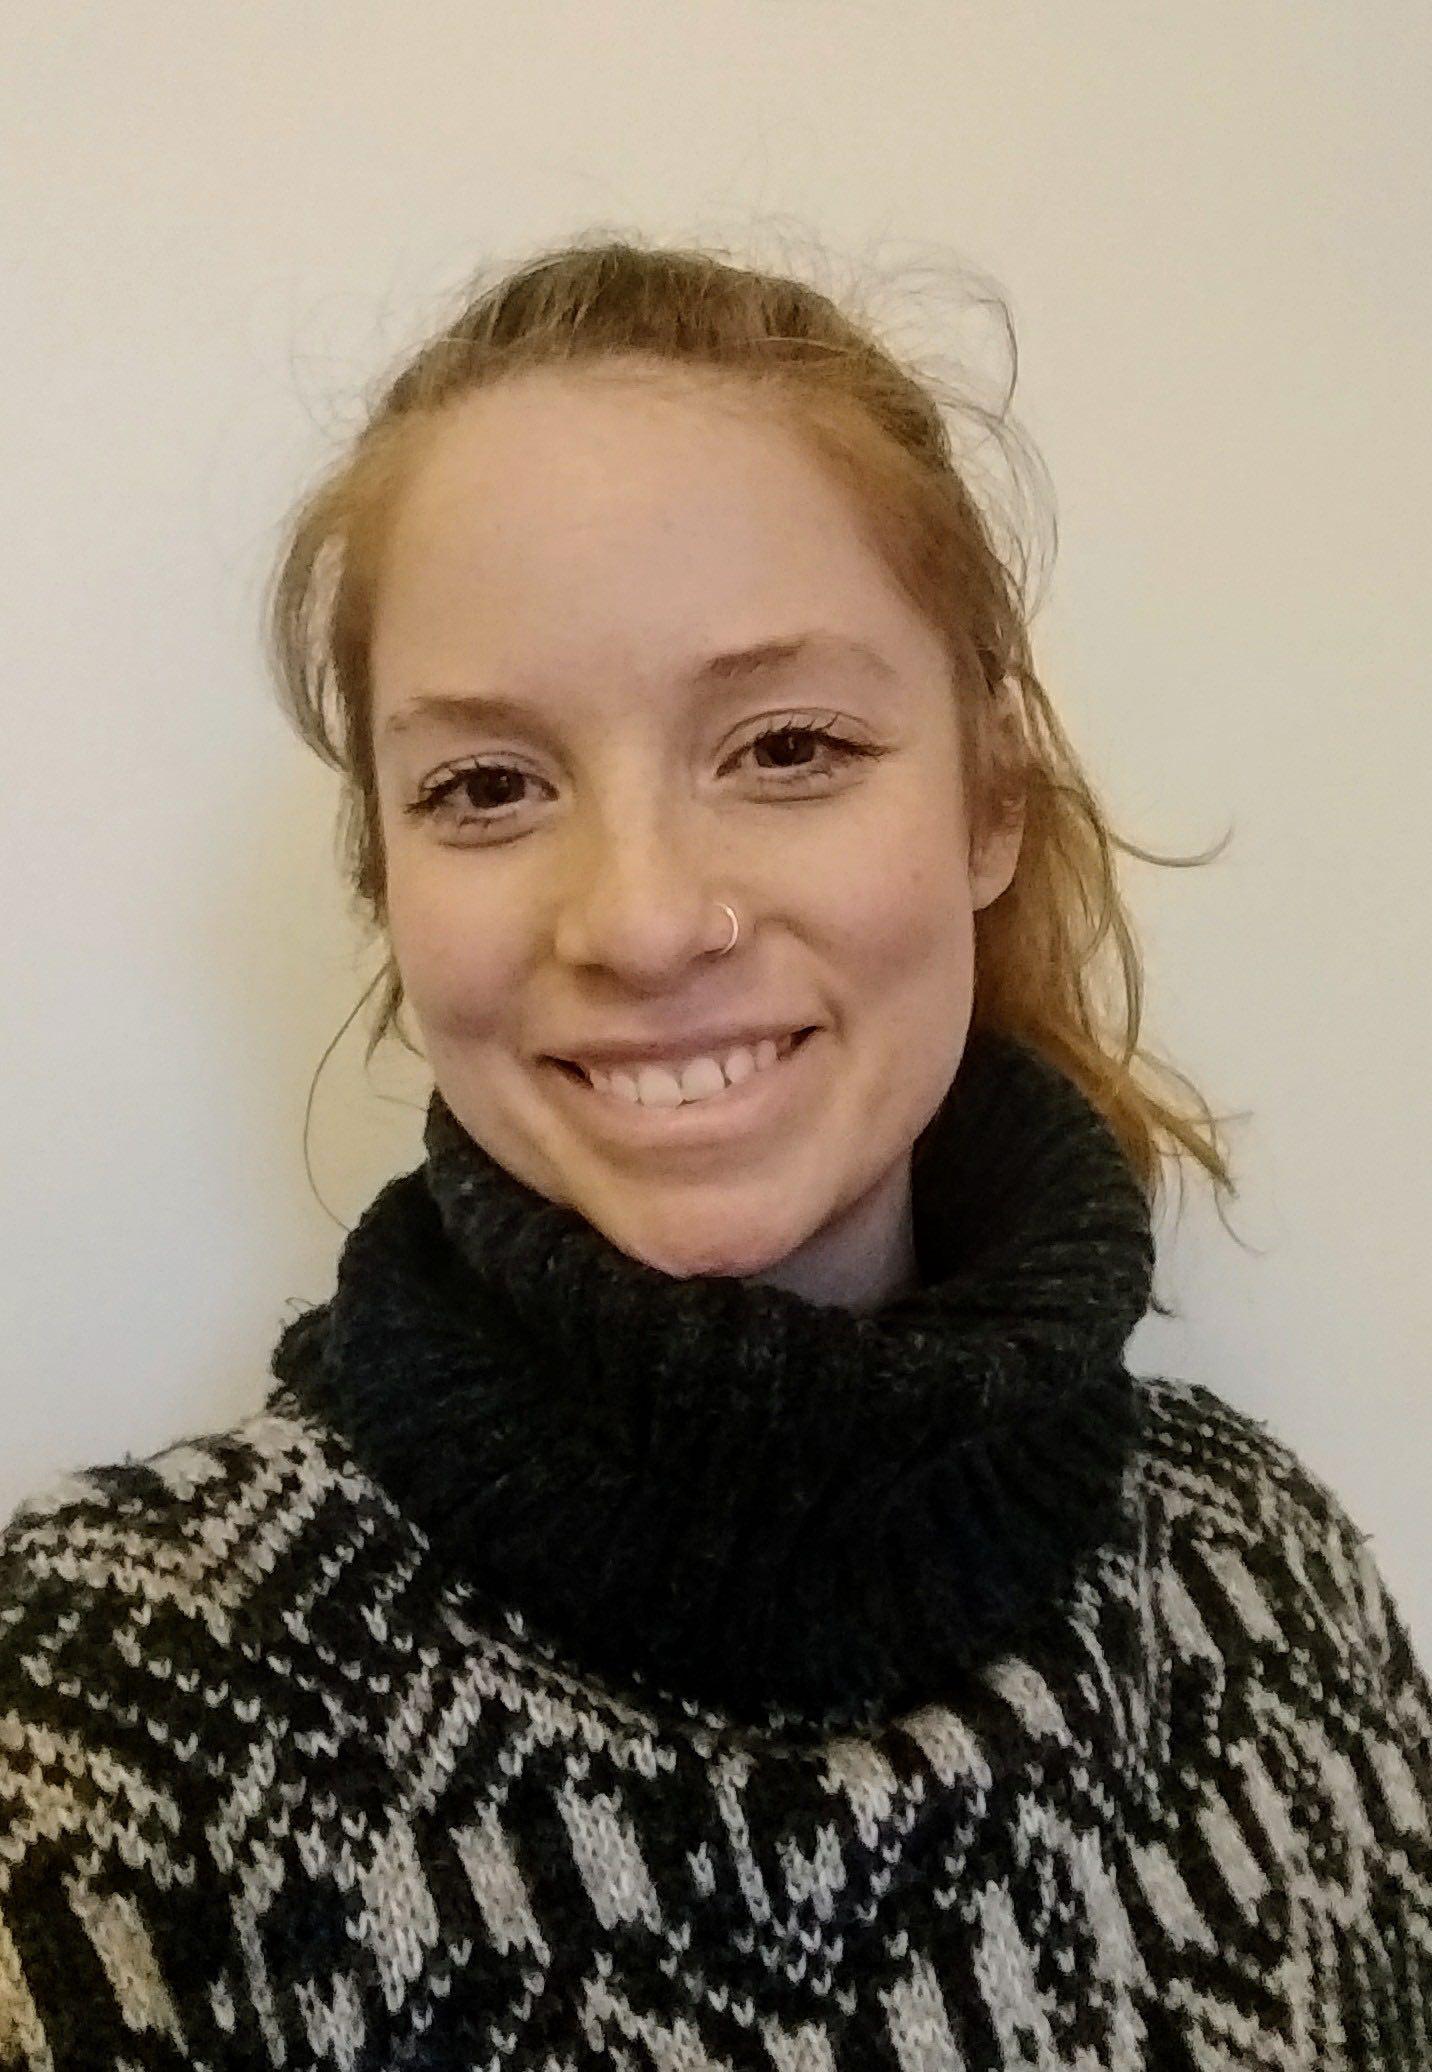 Tara Rutter